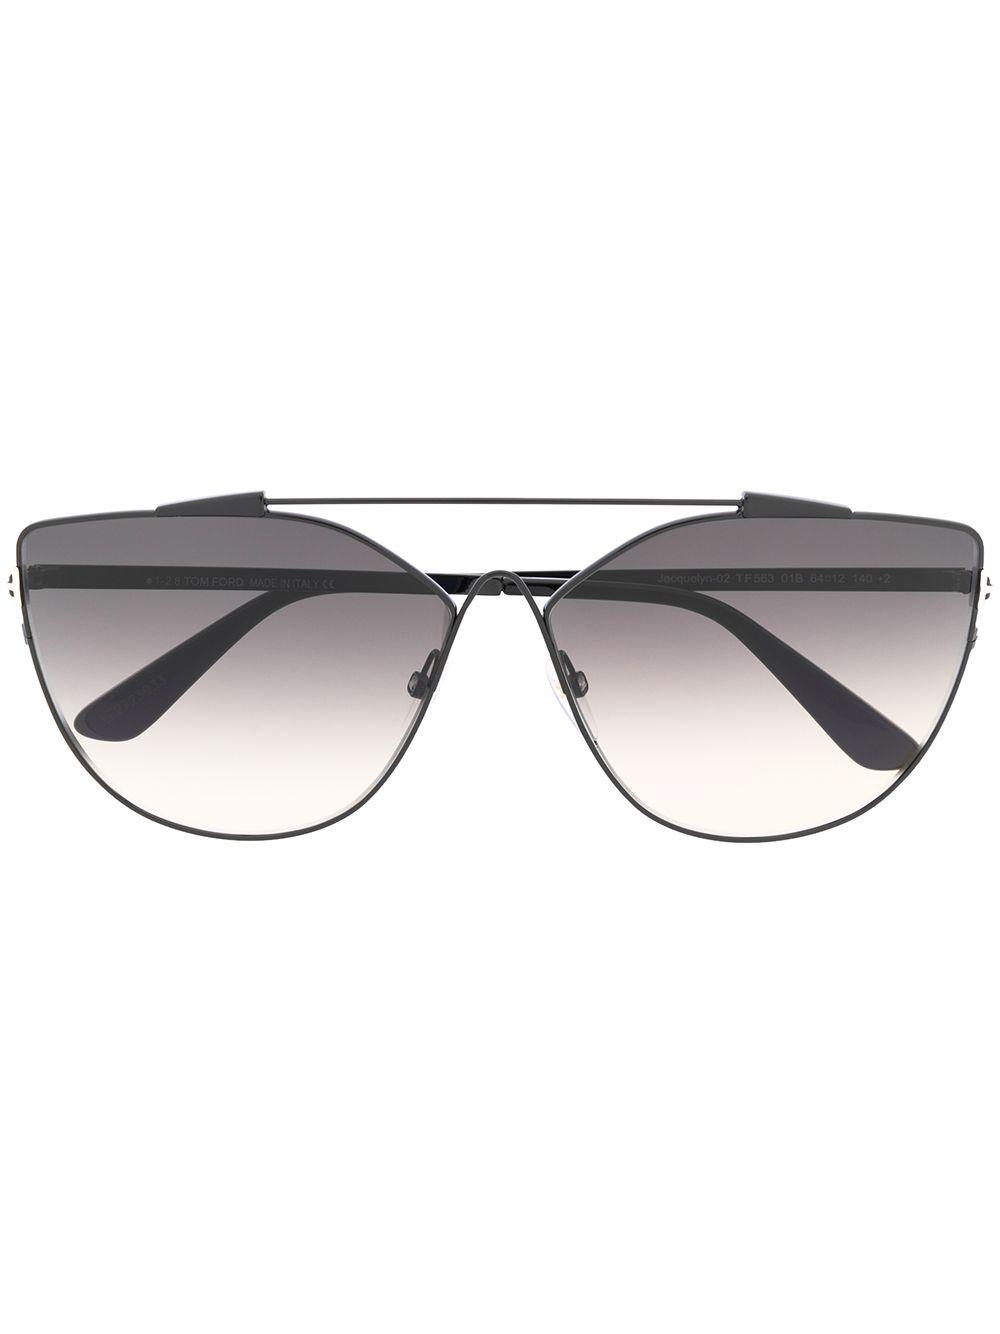 Tom Ford | солнцезащитные очки в оправе 'кошачий глаз' | Clouty